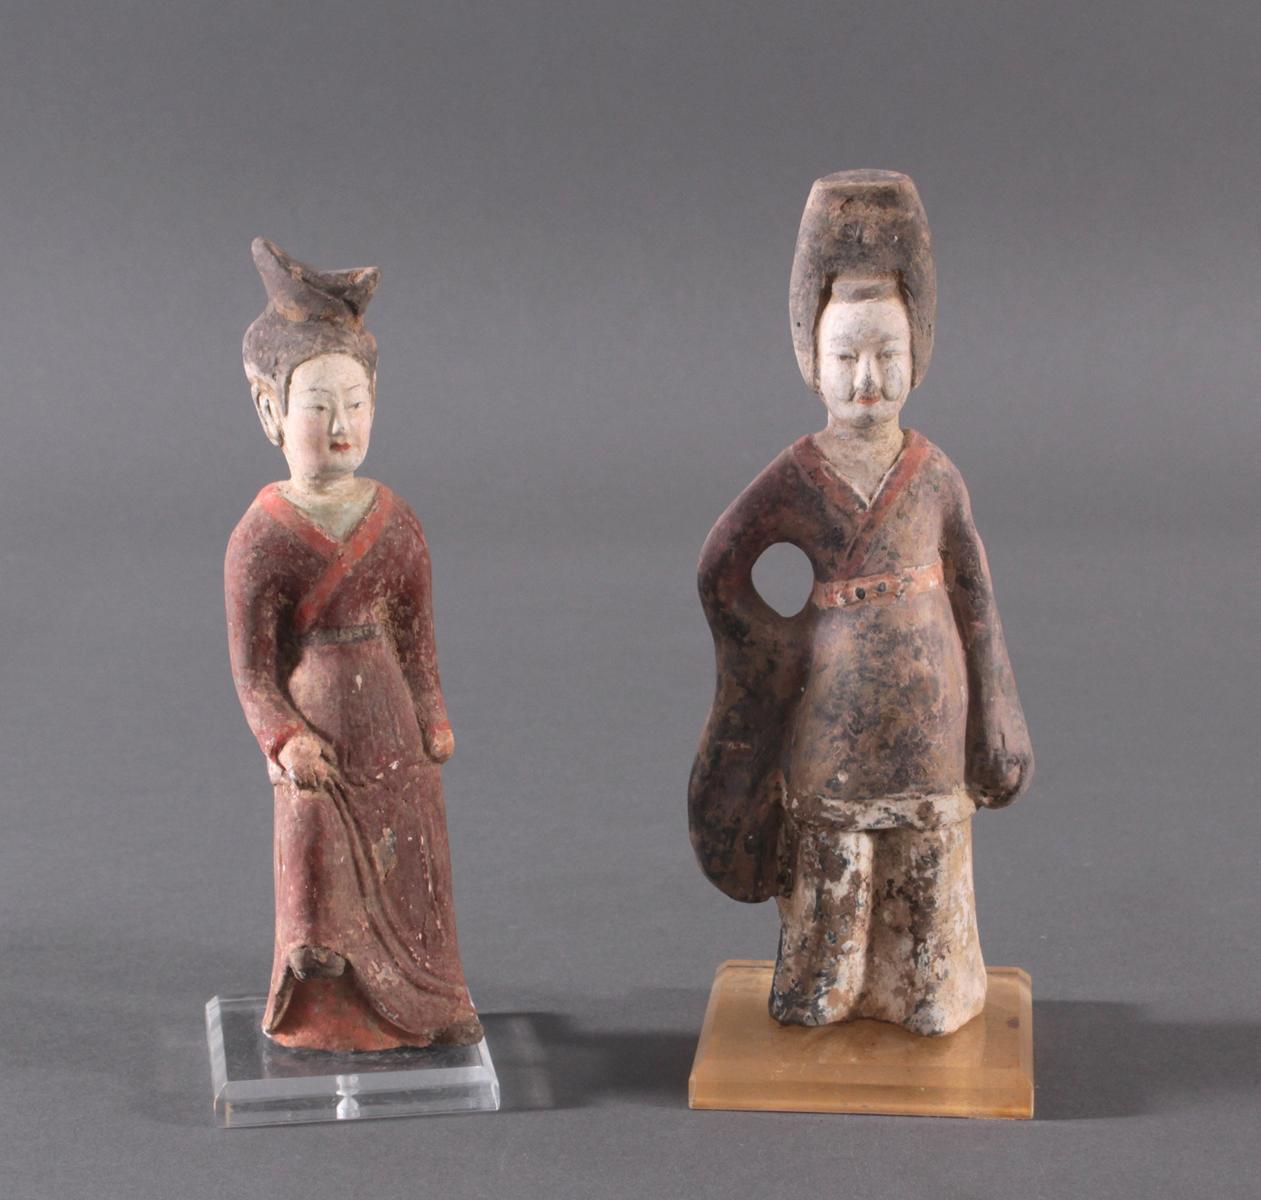 China TANG-Dynastie, 2 Figuren aus Ton